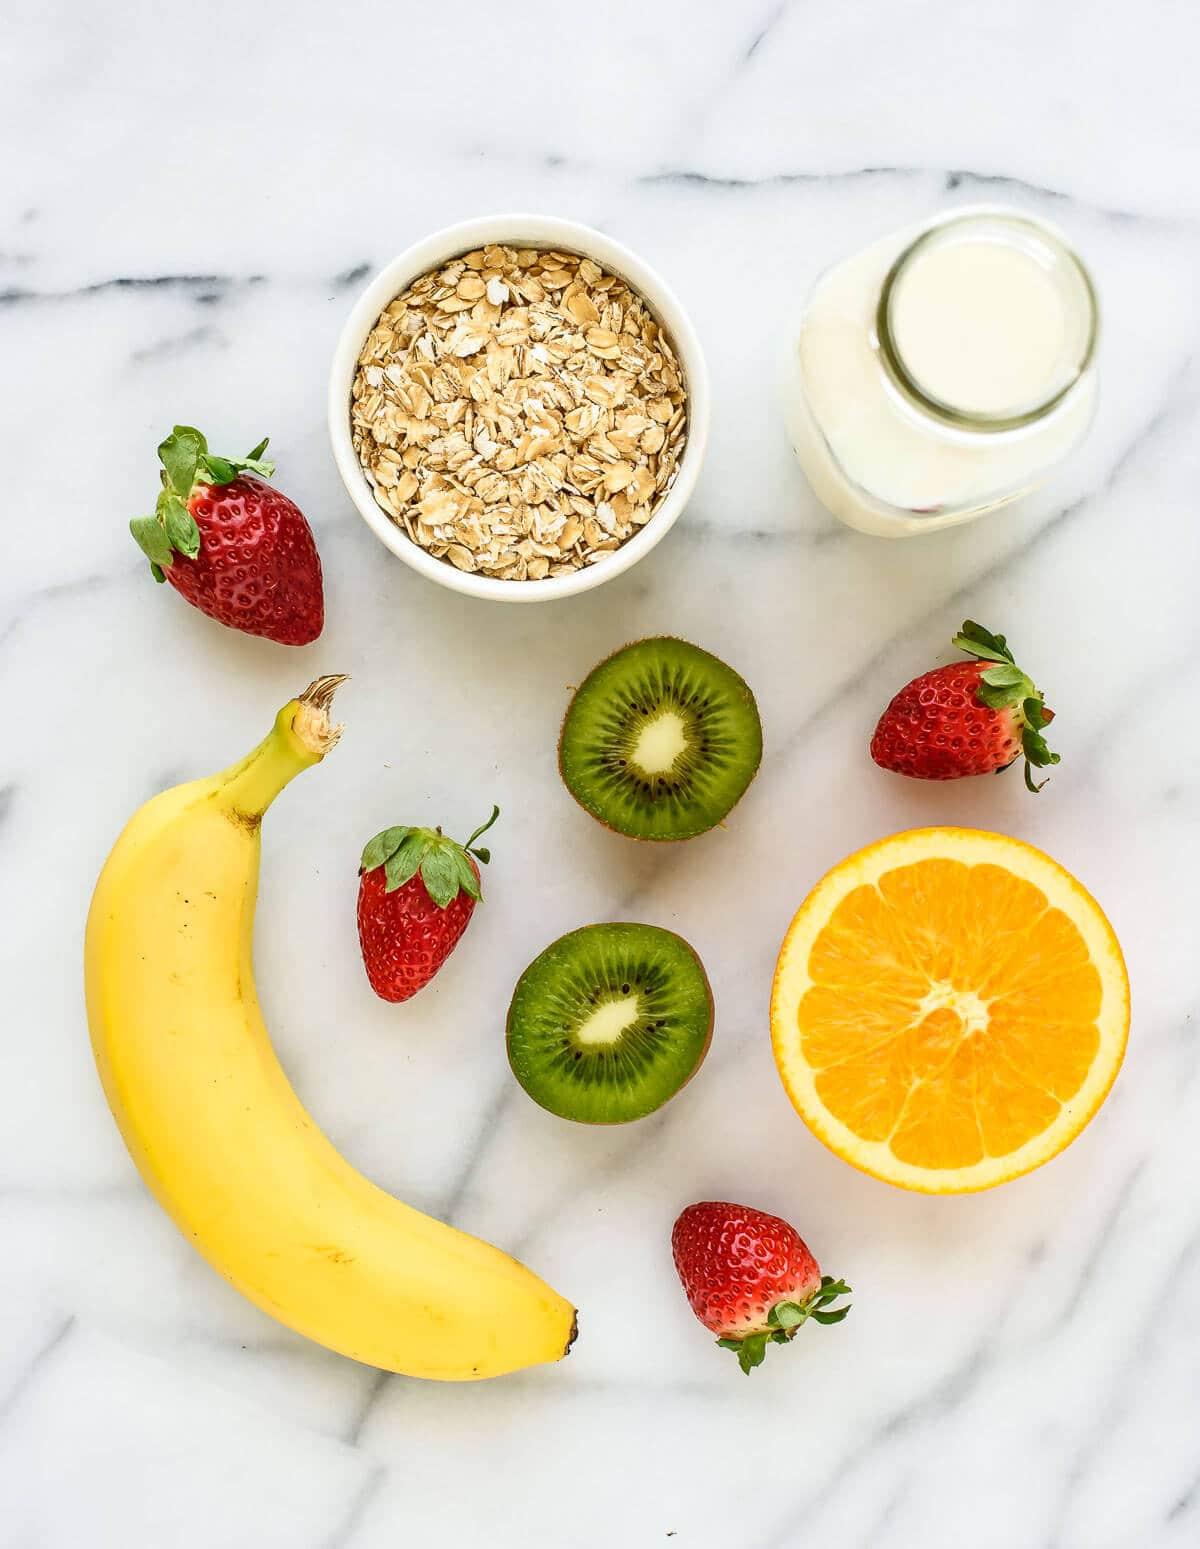 A healthy Strawberry Kiwi Smoothie with orange, banana, and oatmeal.